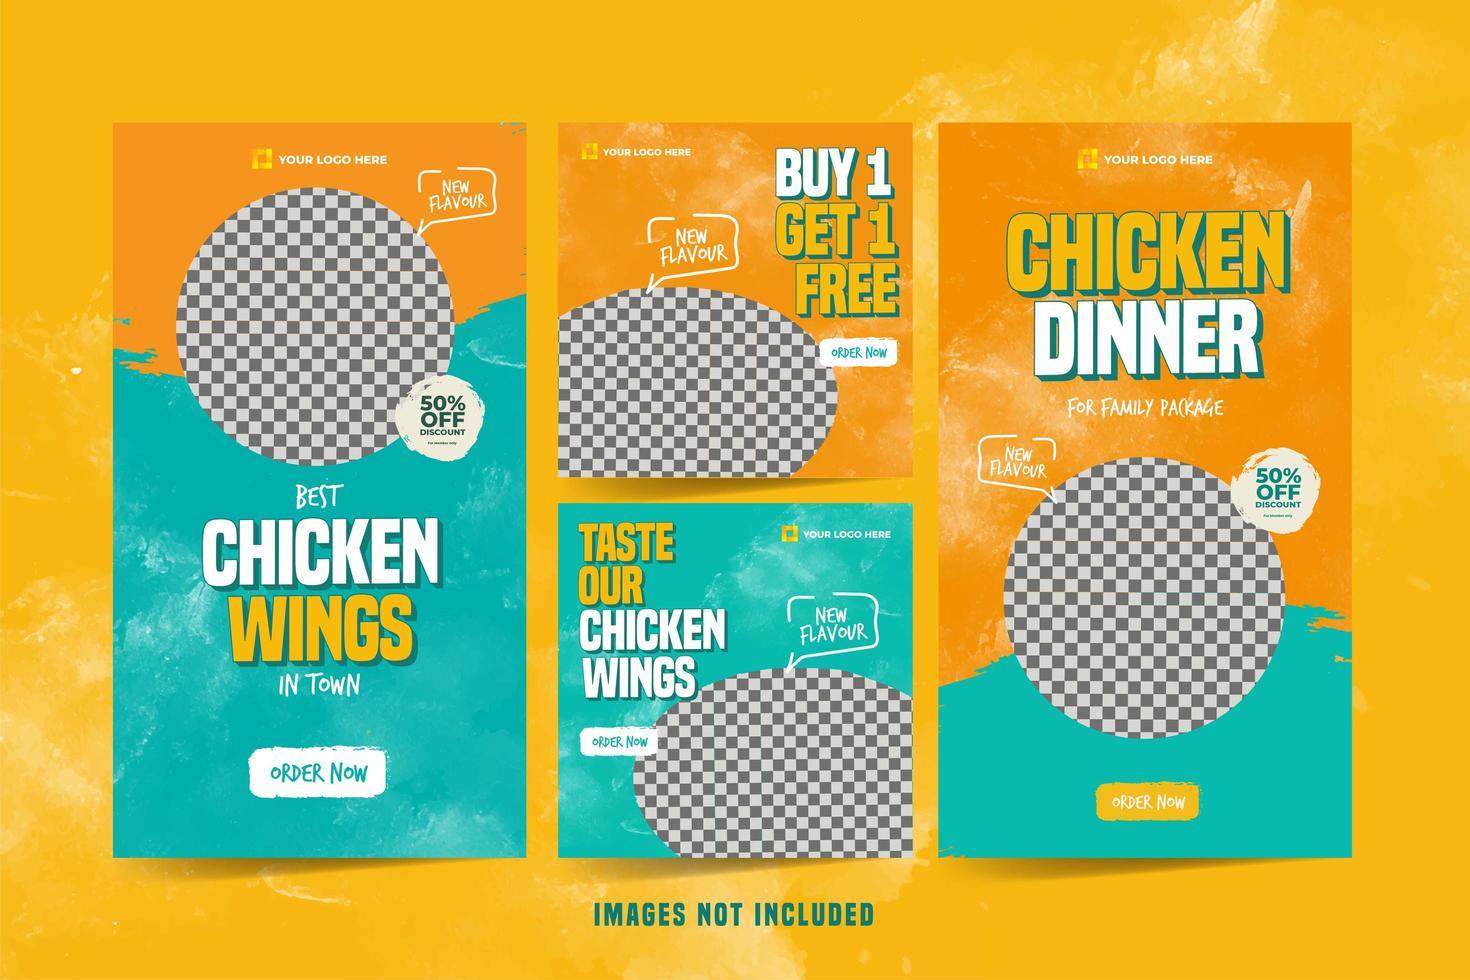 conjunto de modelo de anúncio de asas de frango para mídia social vetor